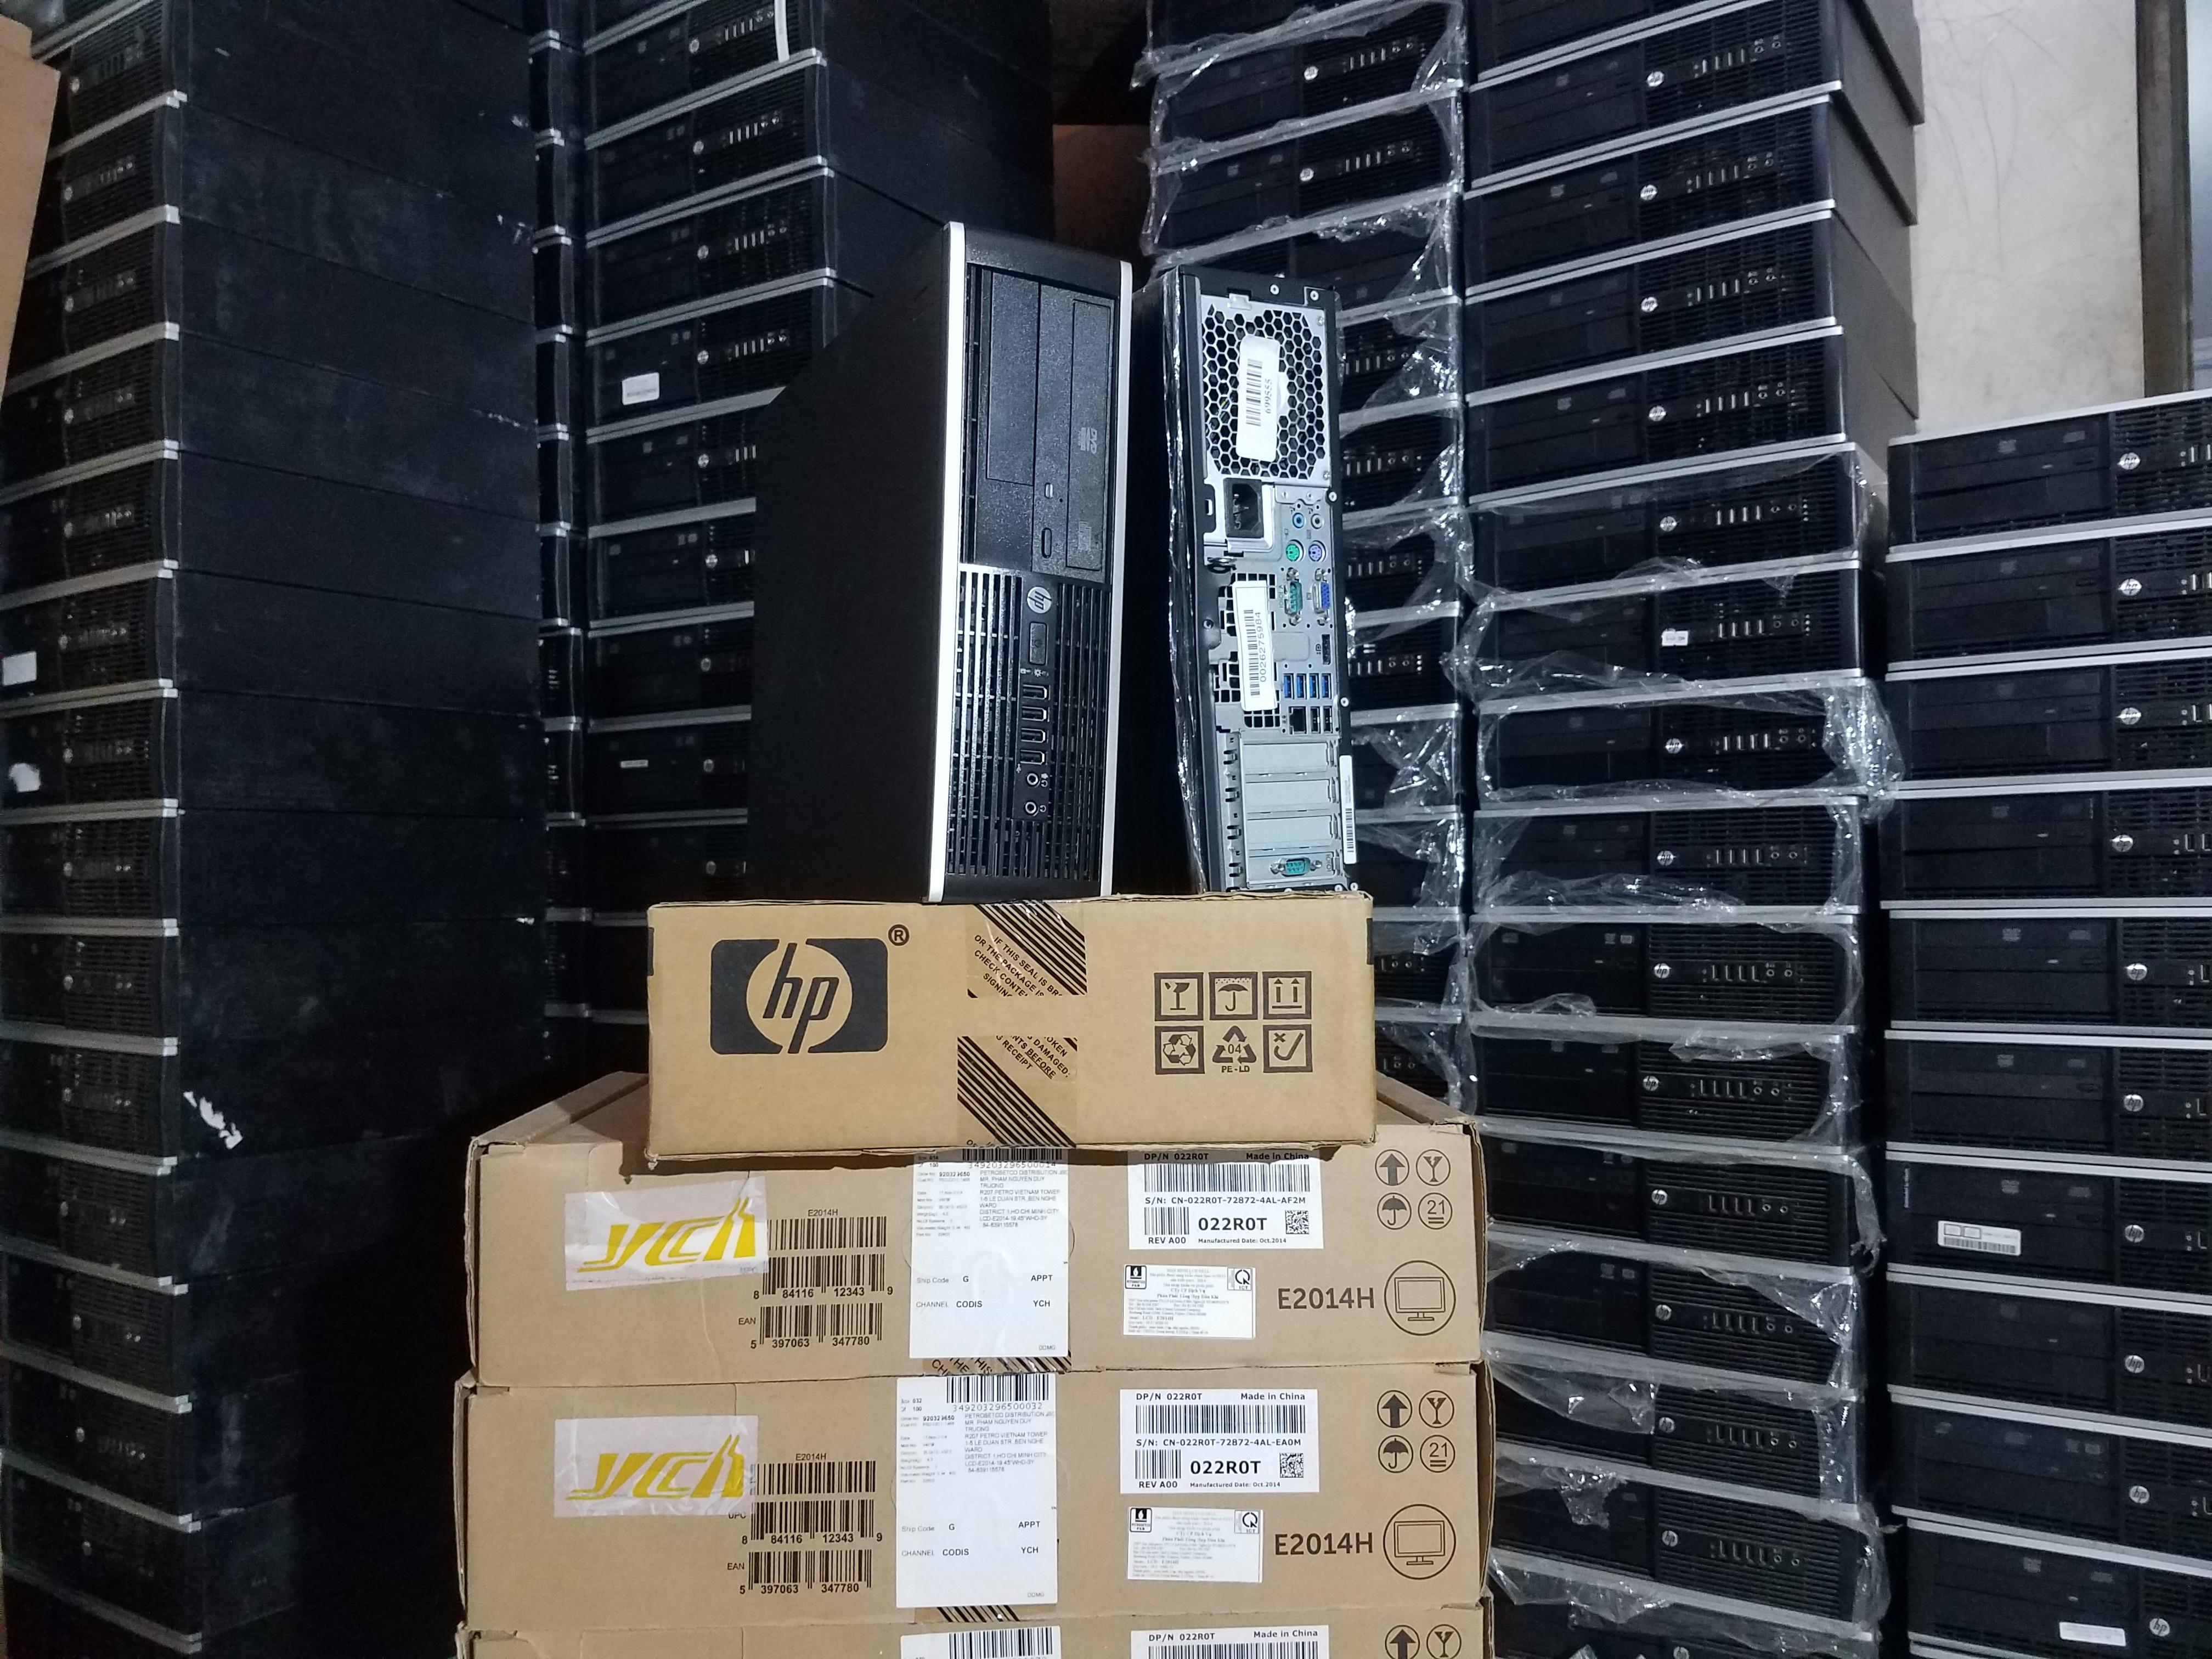 HP 6300 Pro (chíp Core i5 3470 siêu giảm giá)